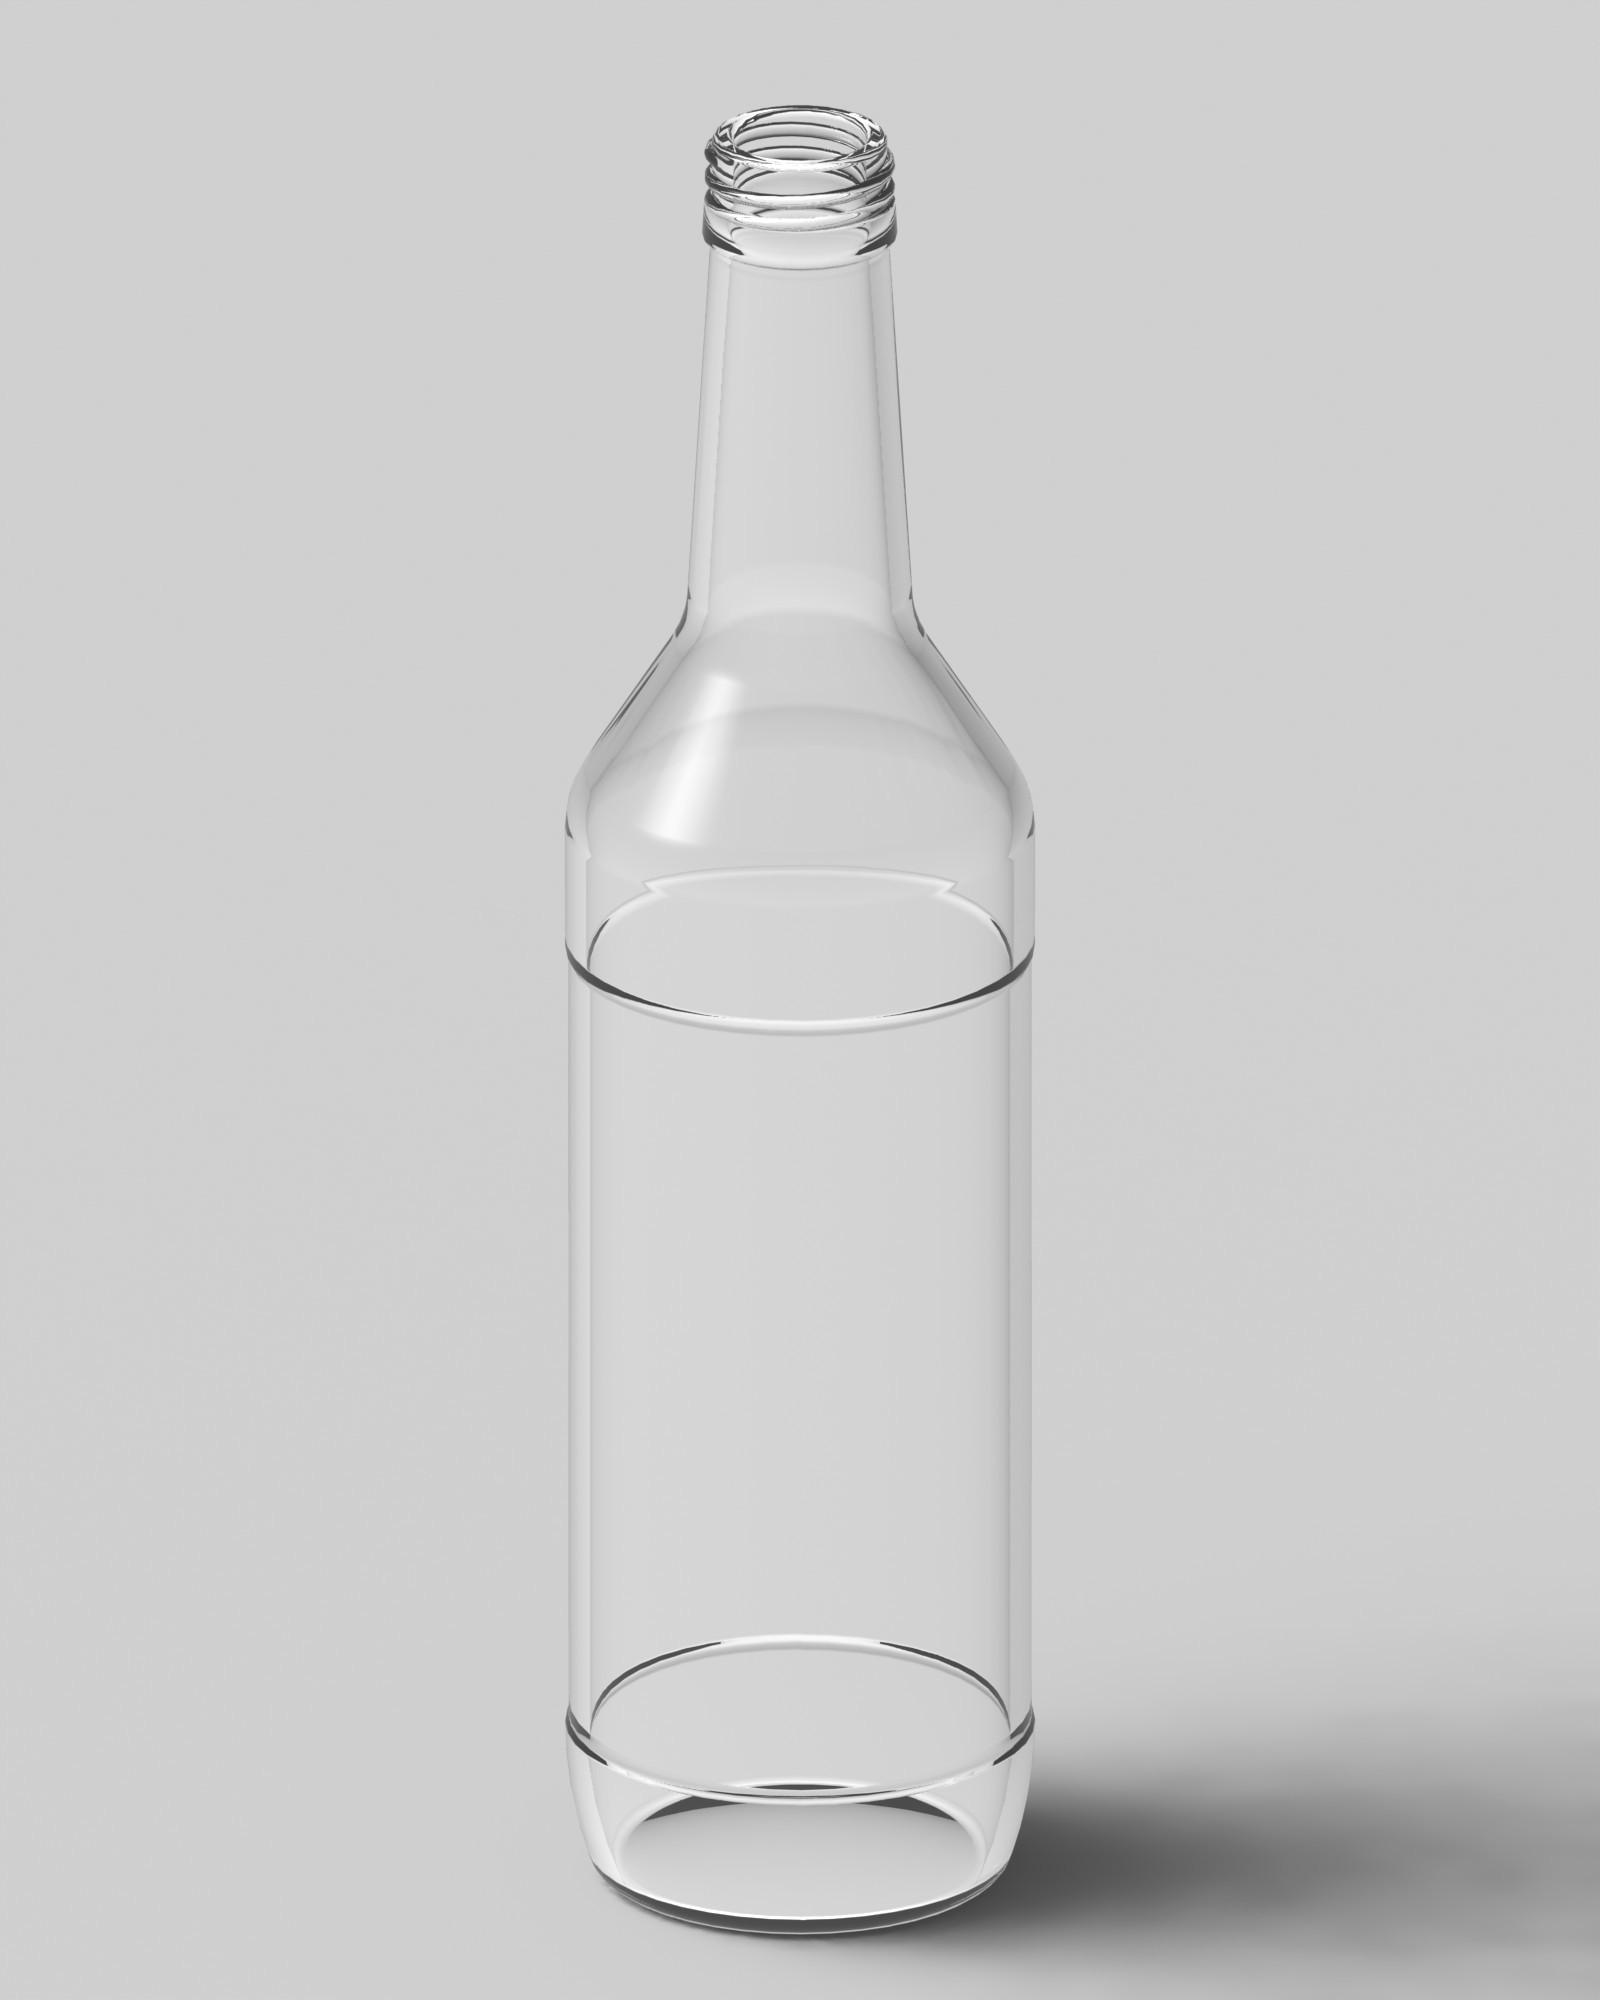 Фото бутылки банки в попе 17 фотография